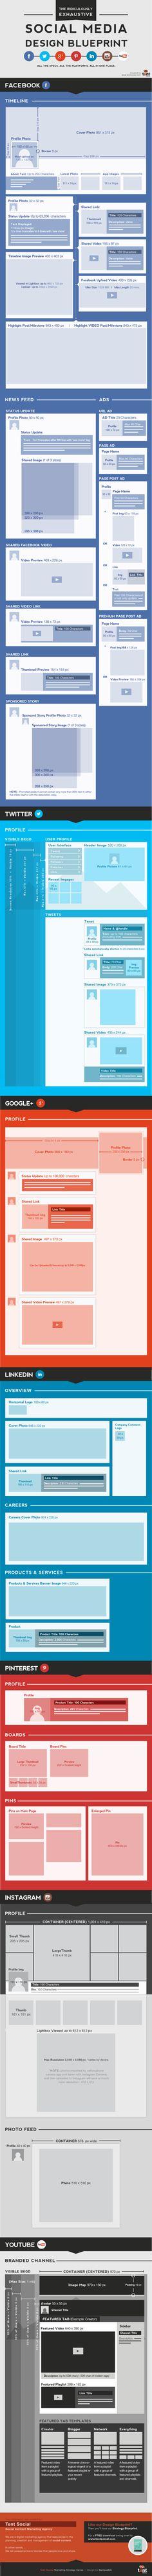 #SocialMedia Design Blueprint #facebook #youtube #pinterest #instagram